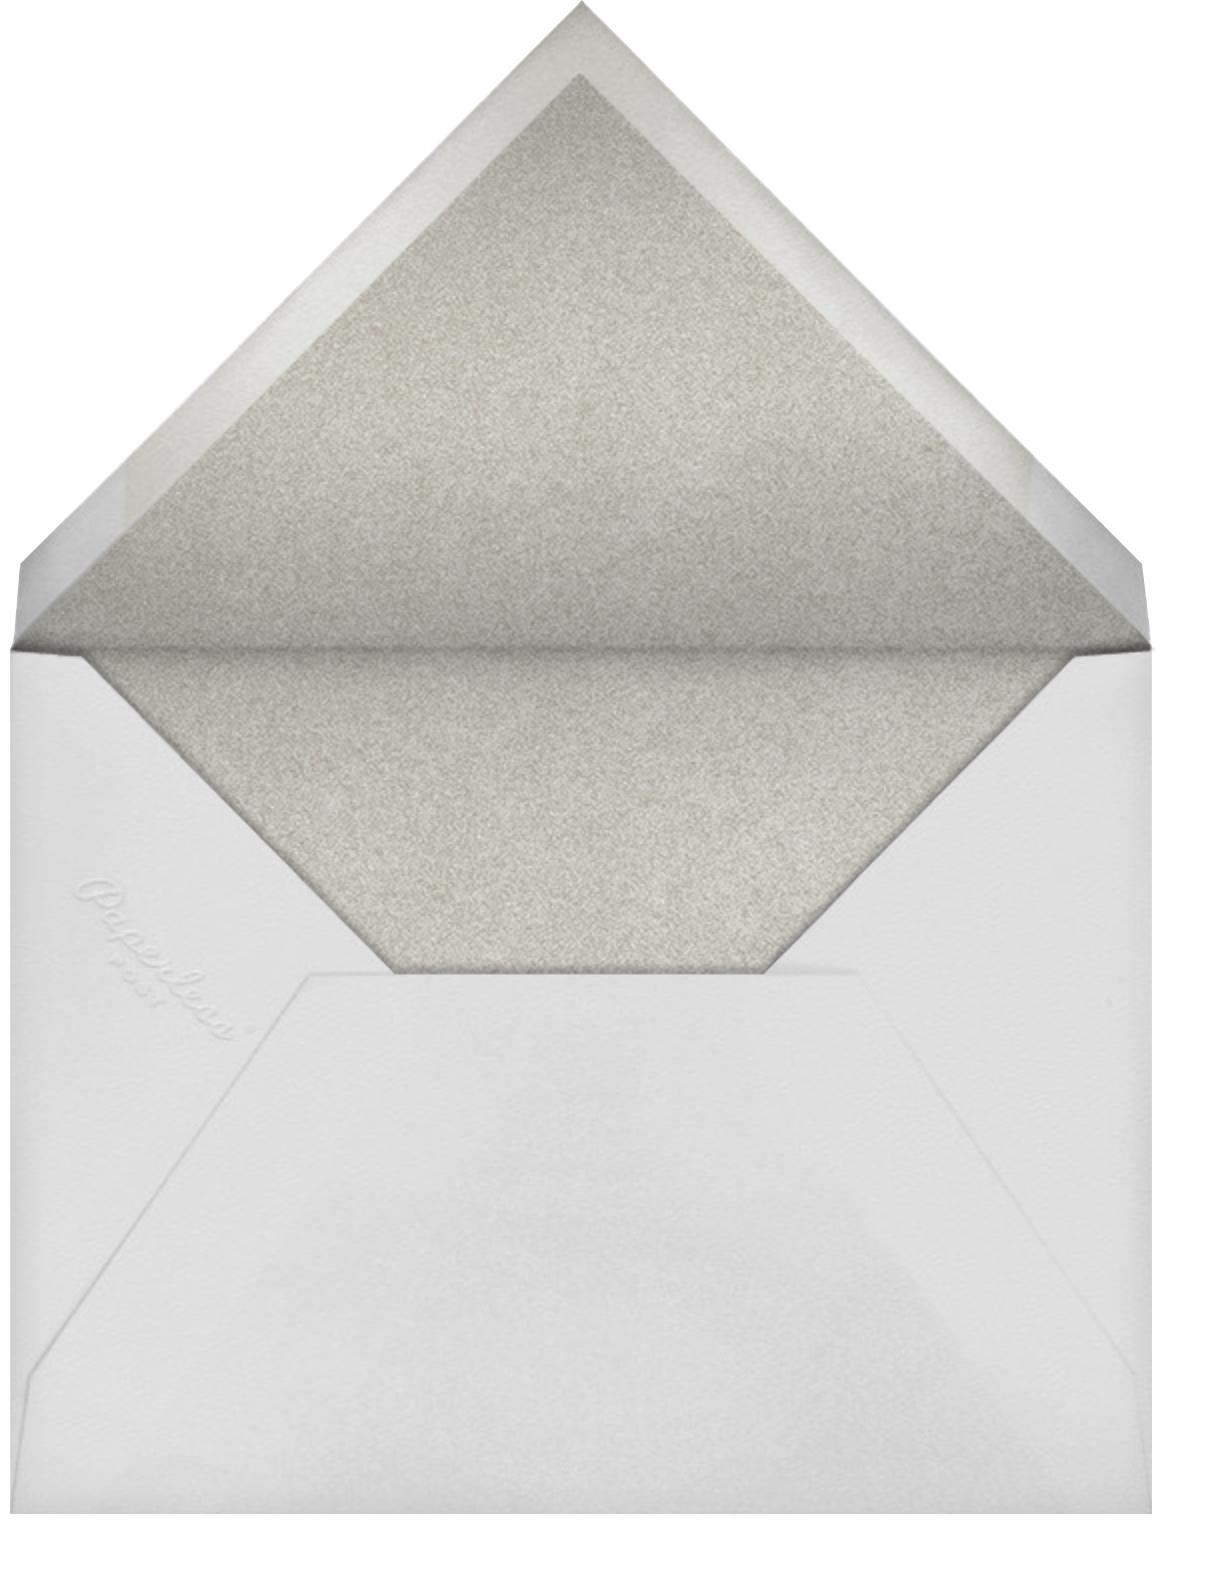 Audrey I (Save The Date) - Newport Blue - Paperless Post - Bridal shower - envelope back